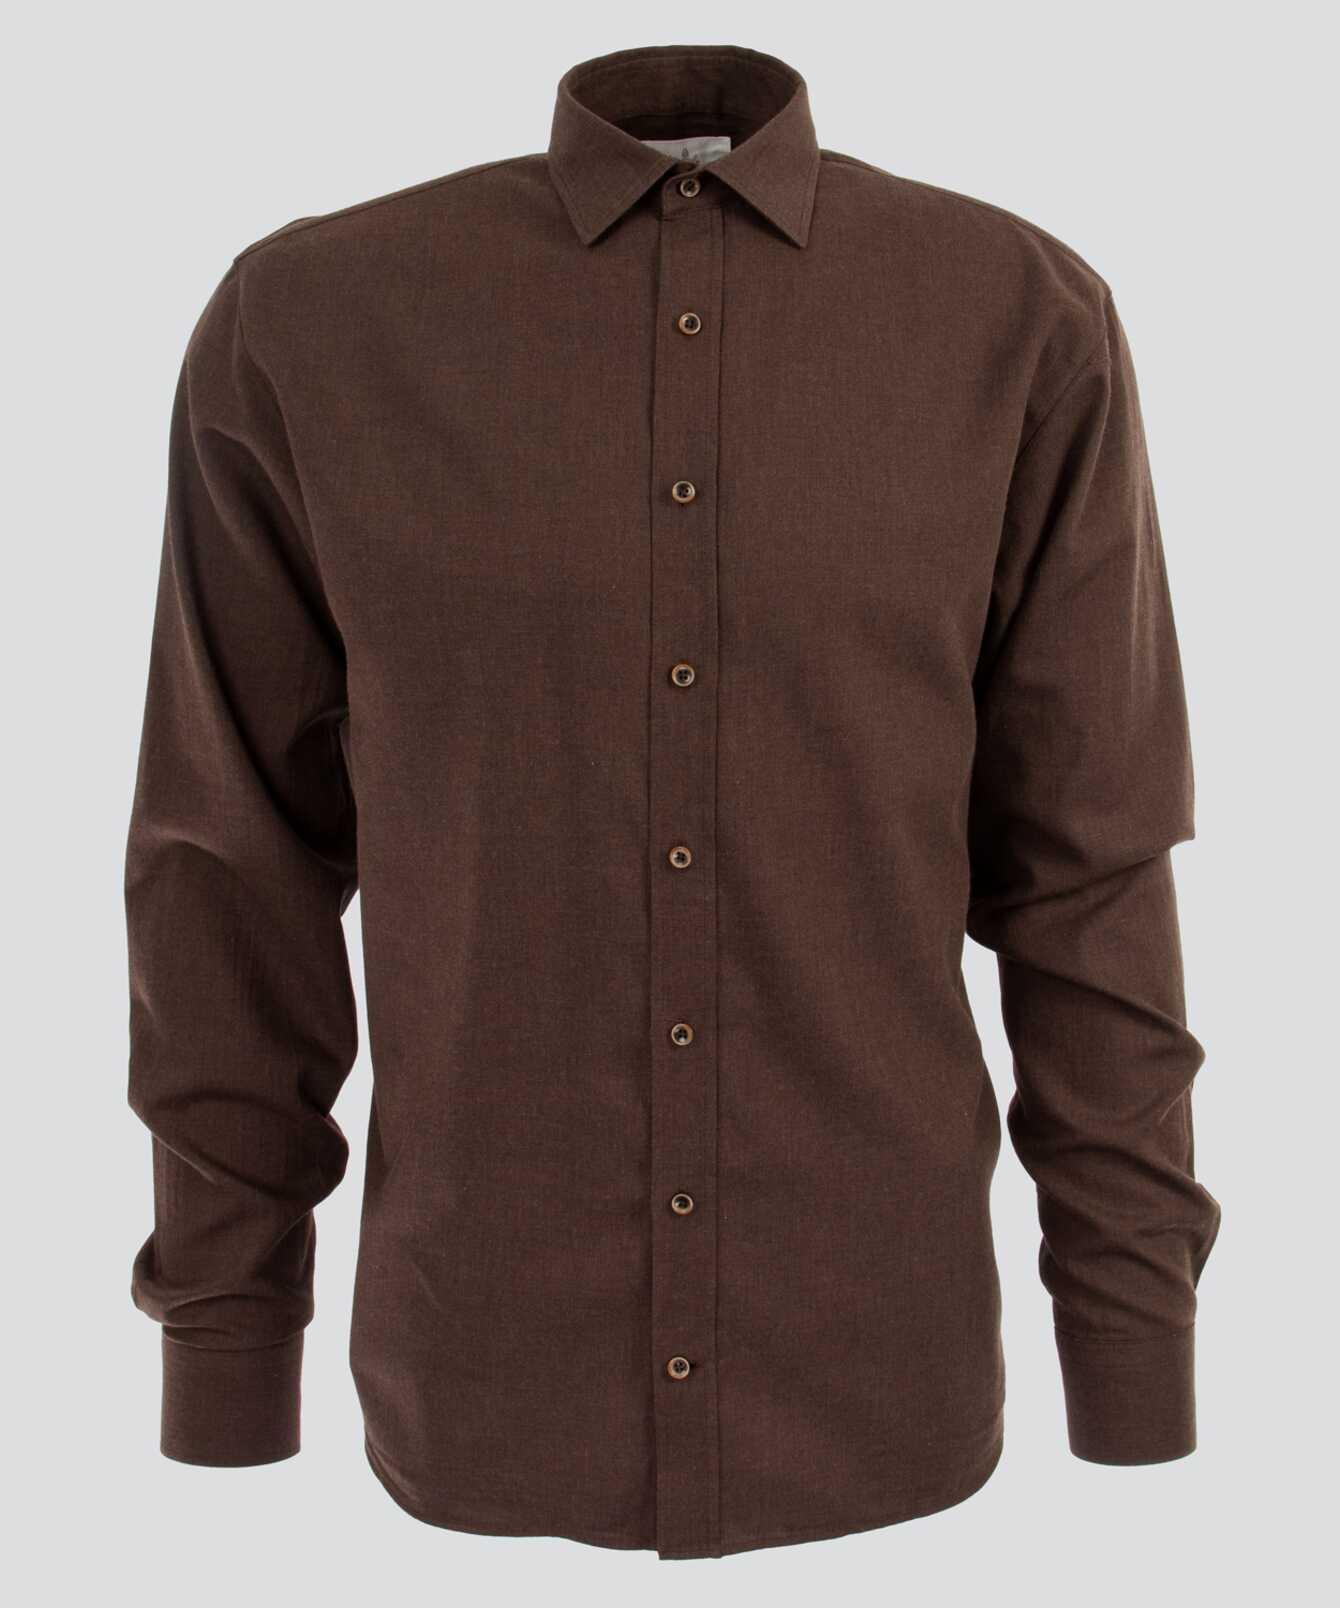 Shirt Costello Brown The Shirt Factory